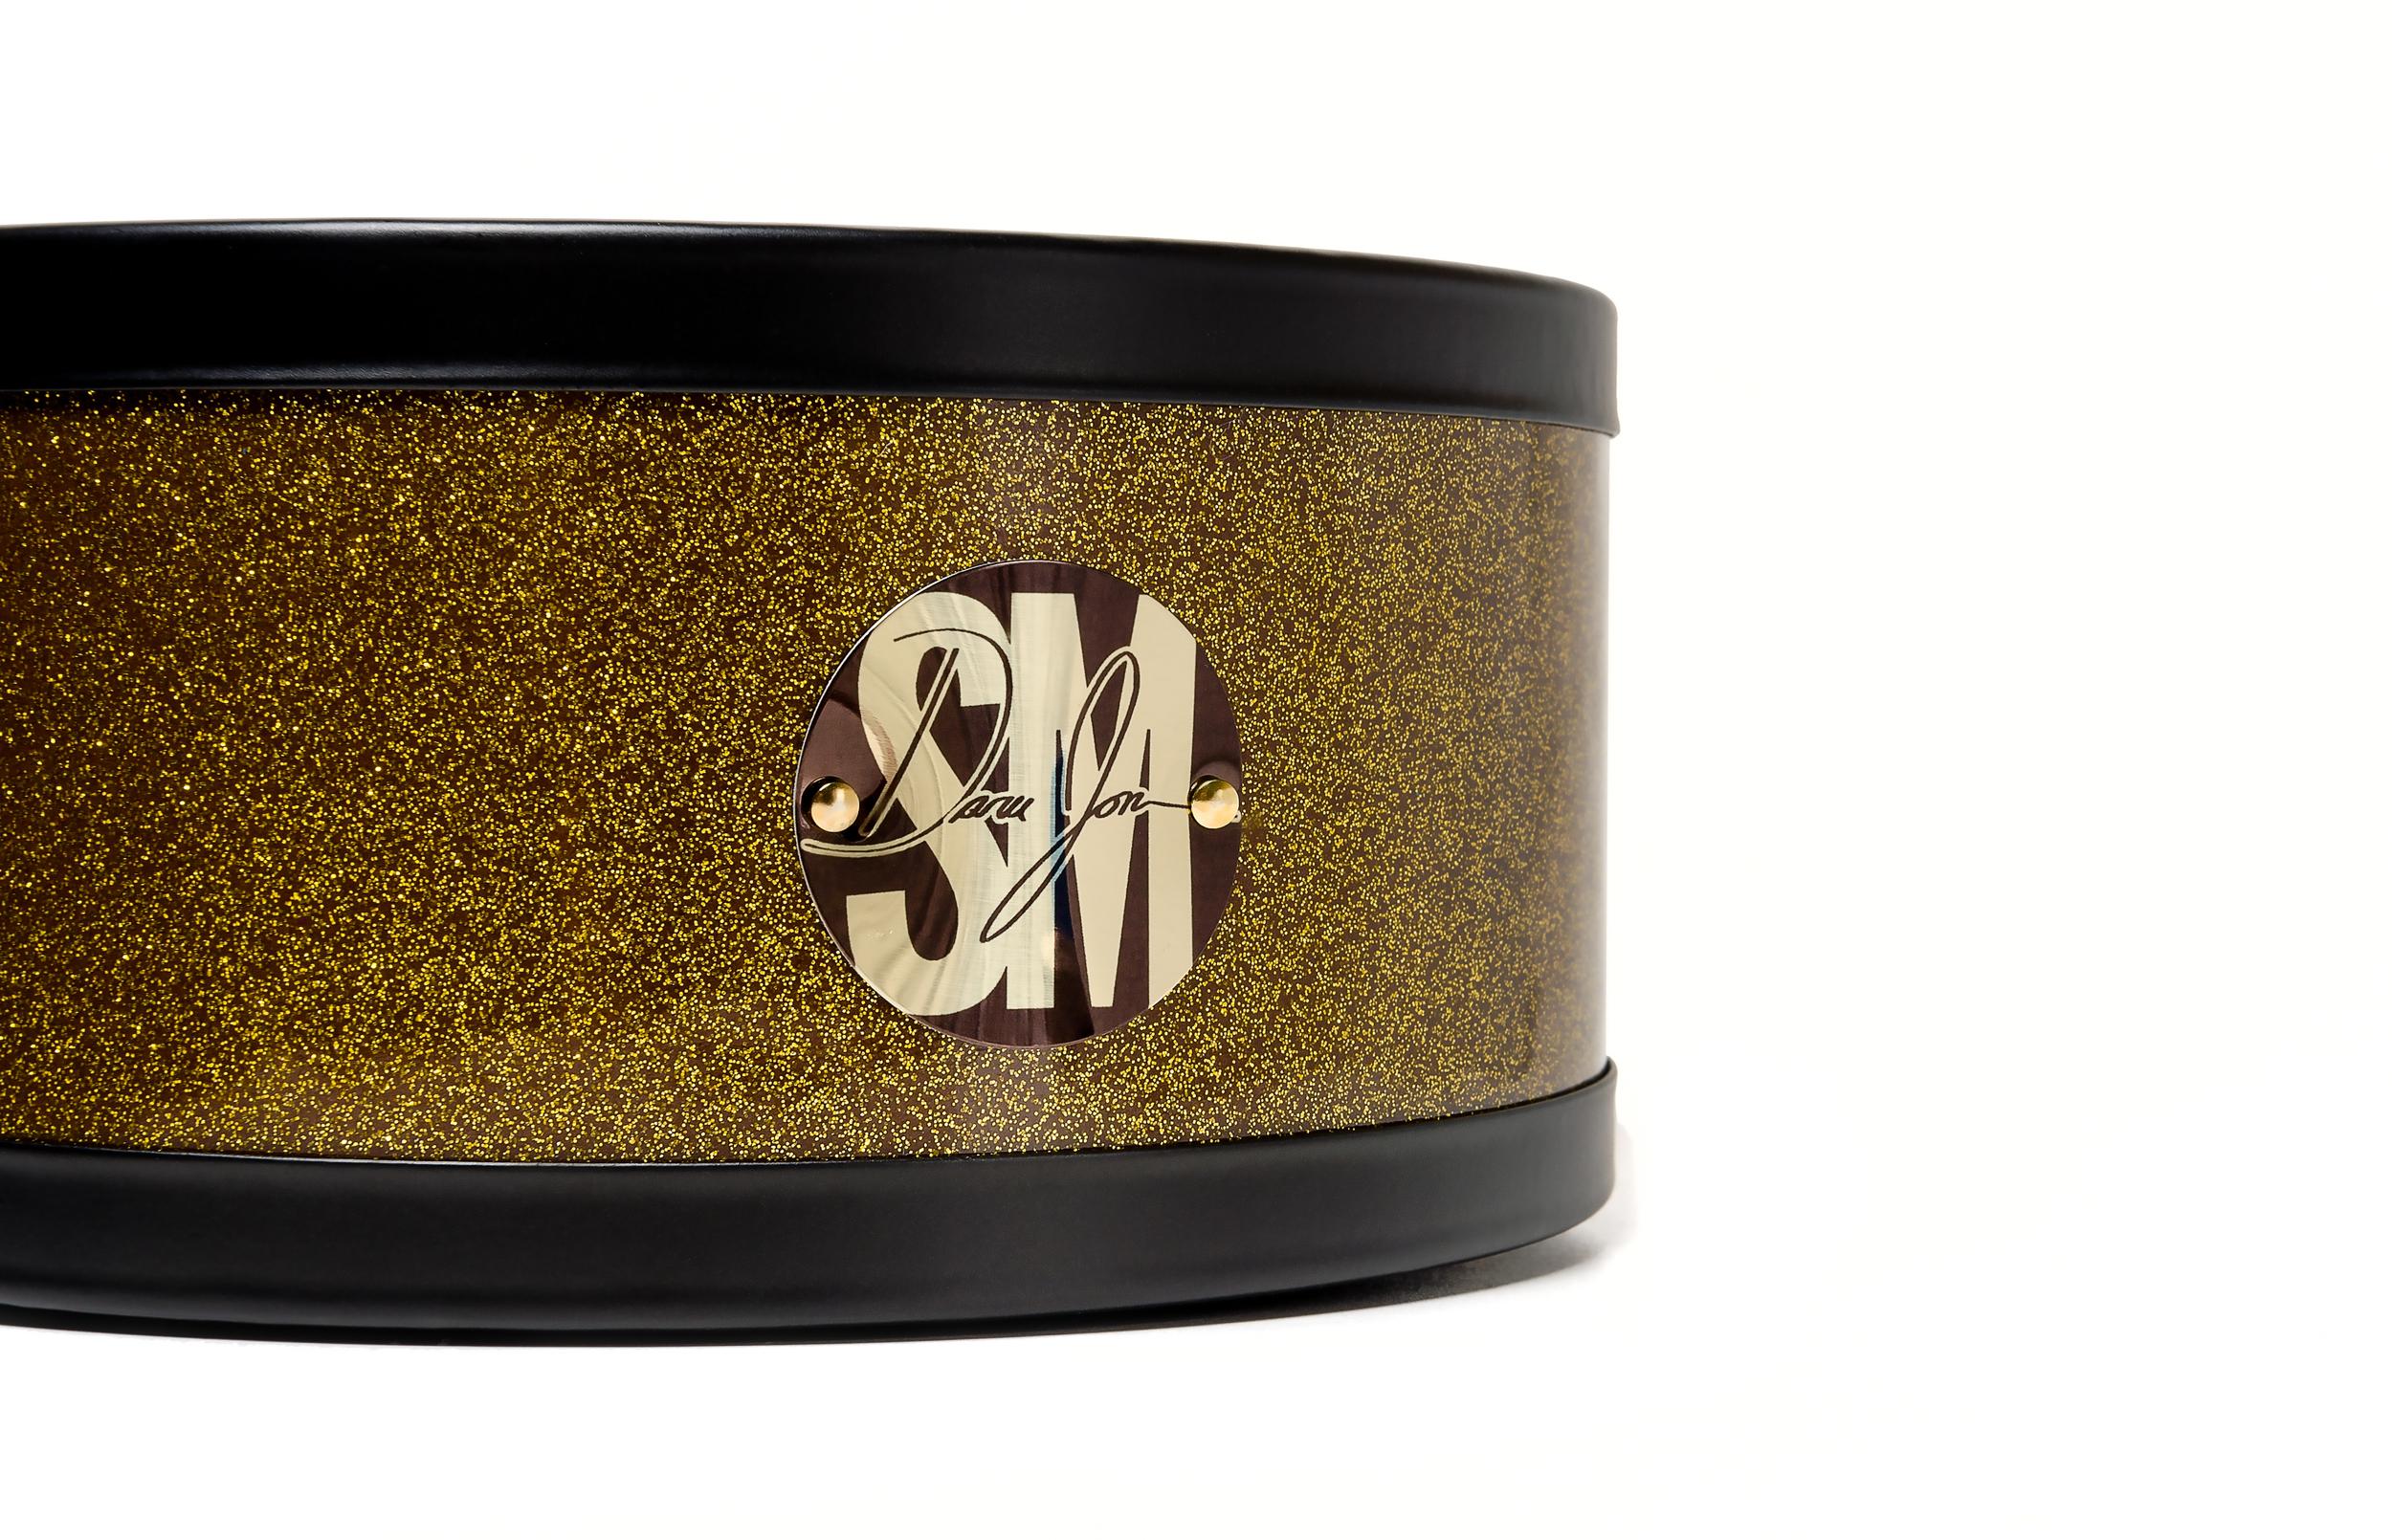 Solomon Mic - Daru Exclusive - Product-4.jpg